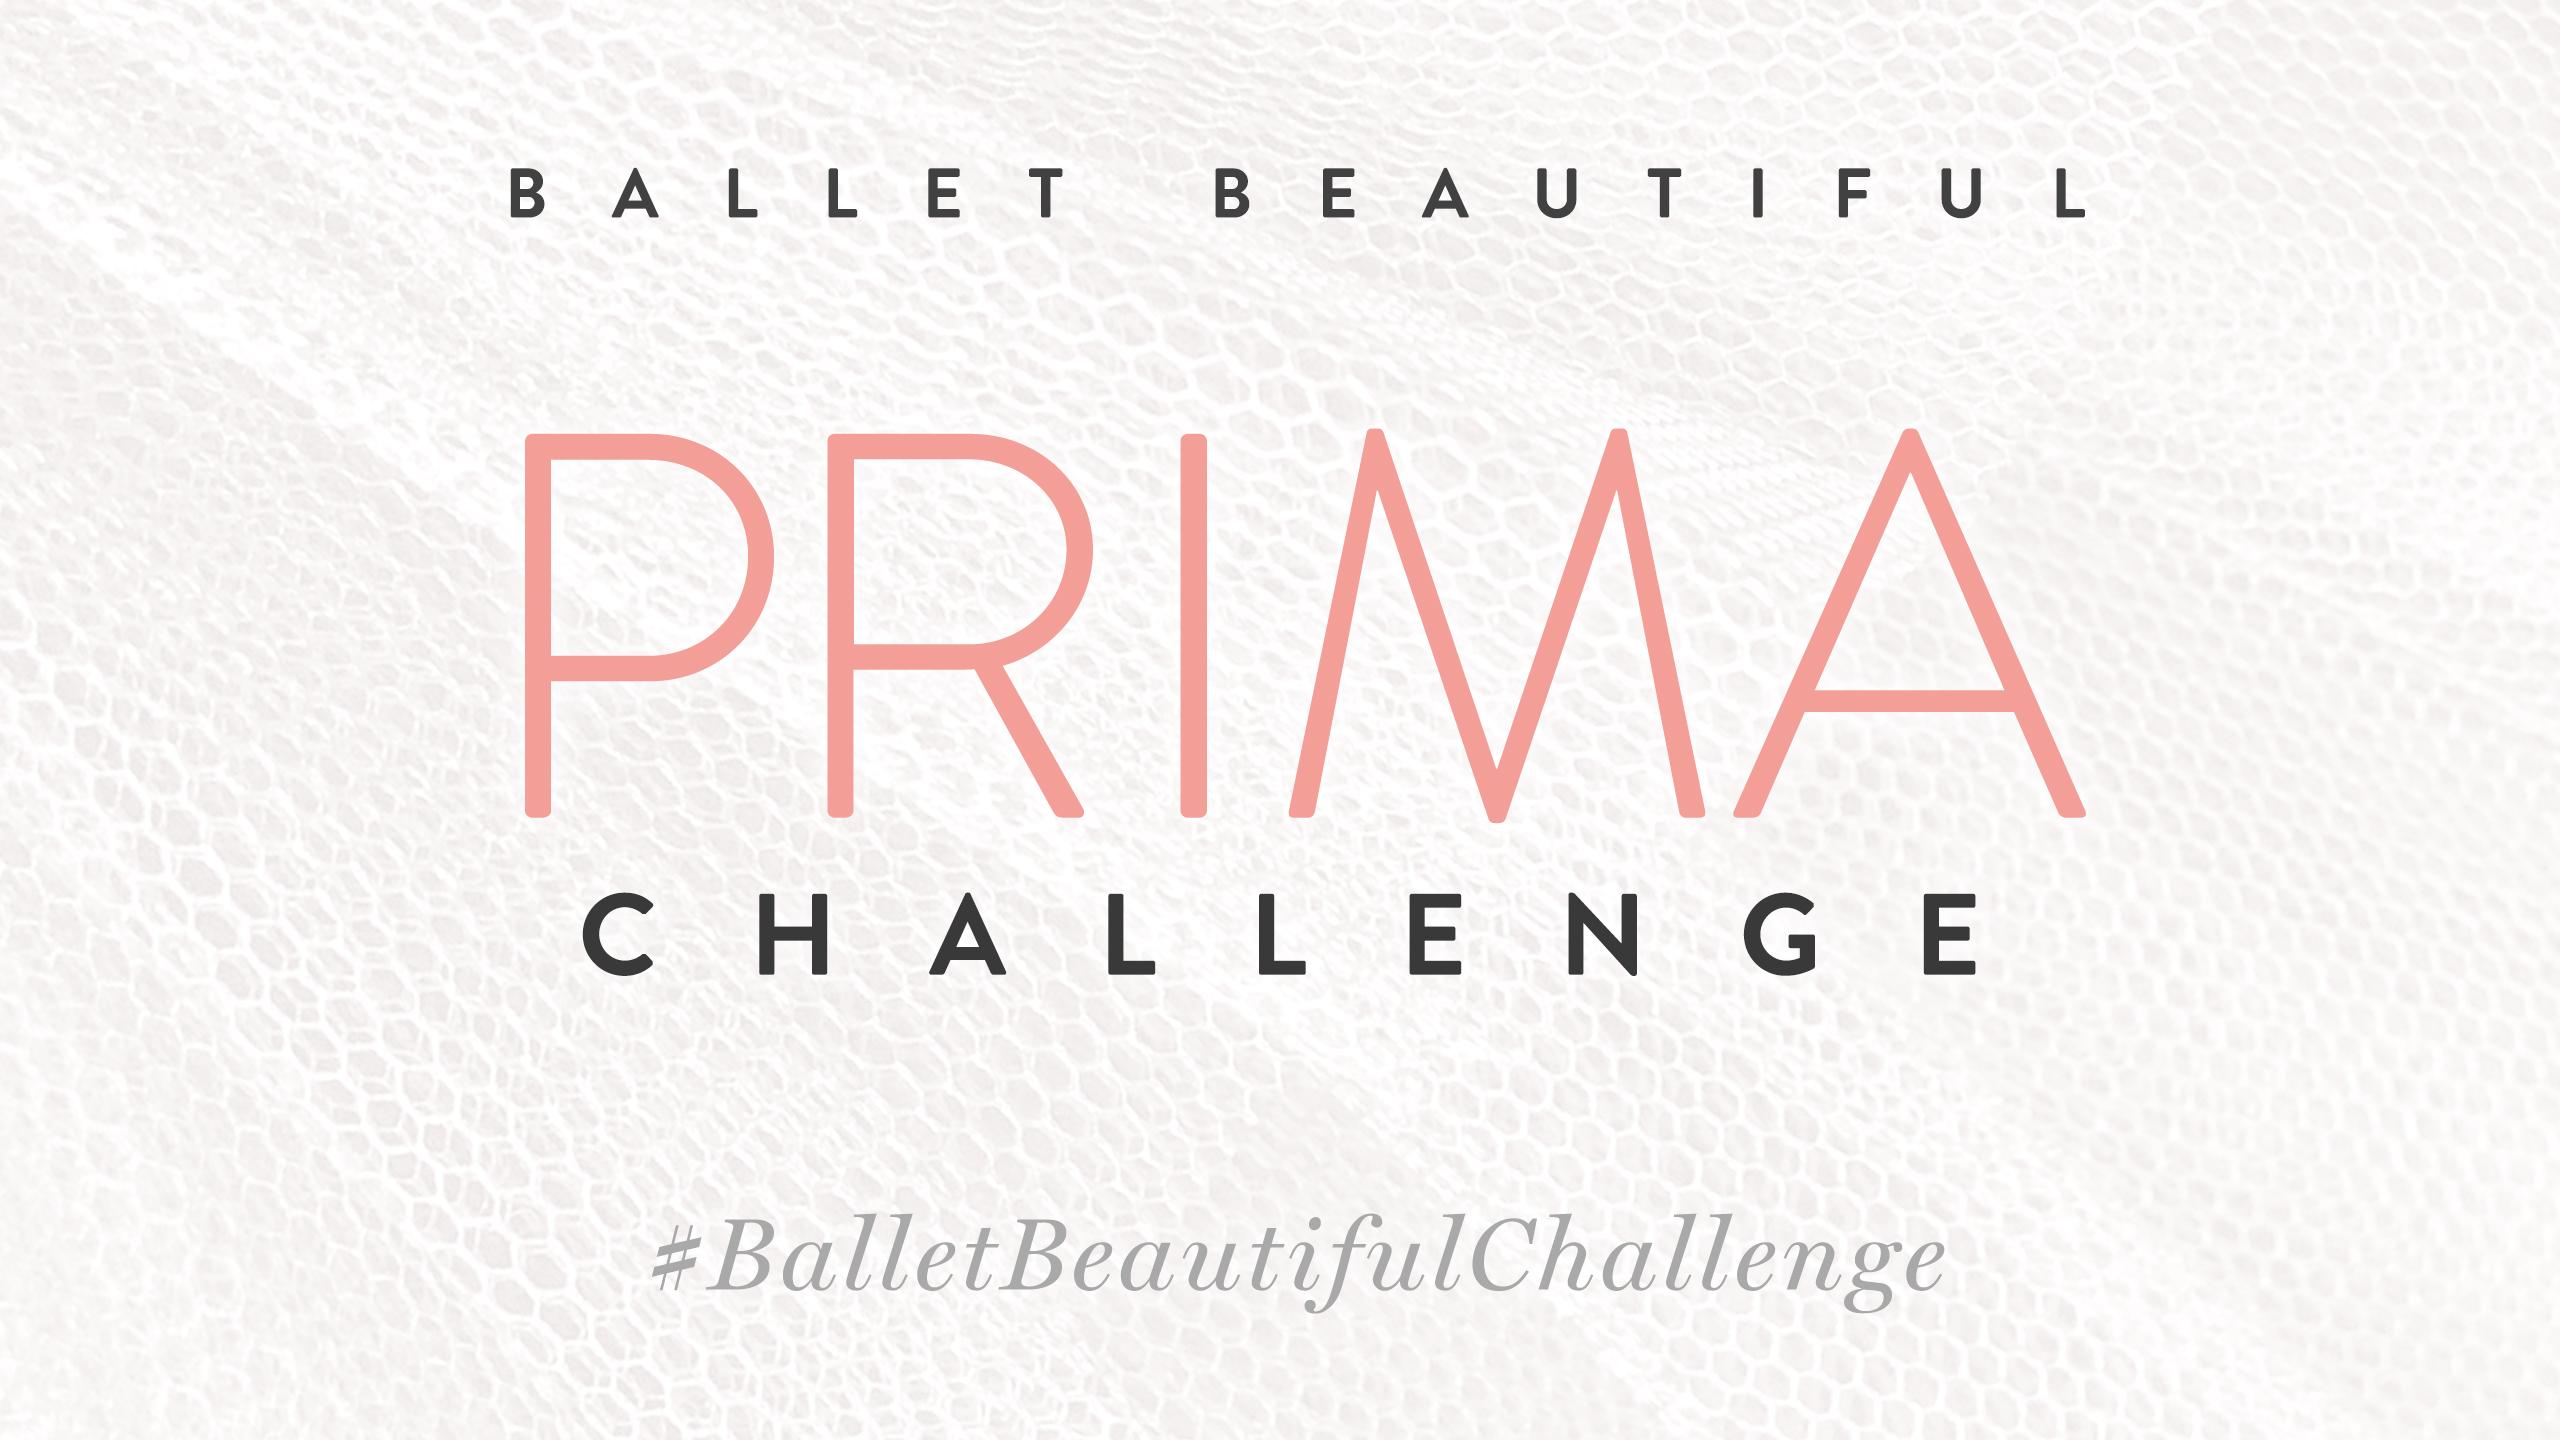 The Prima Challenge